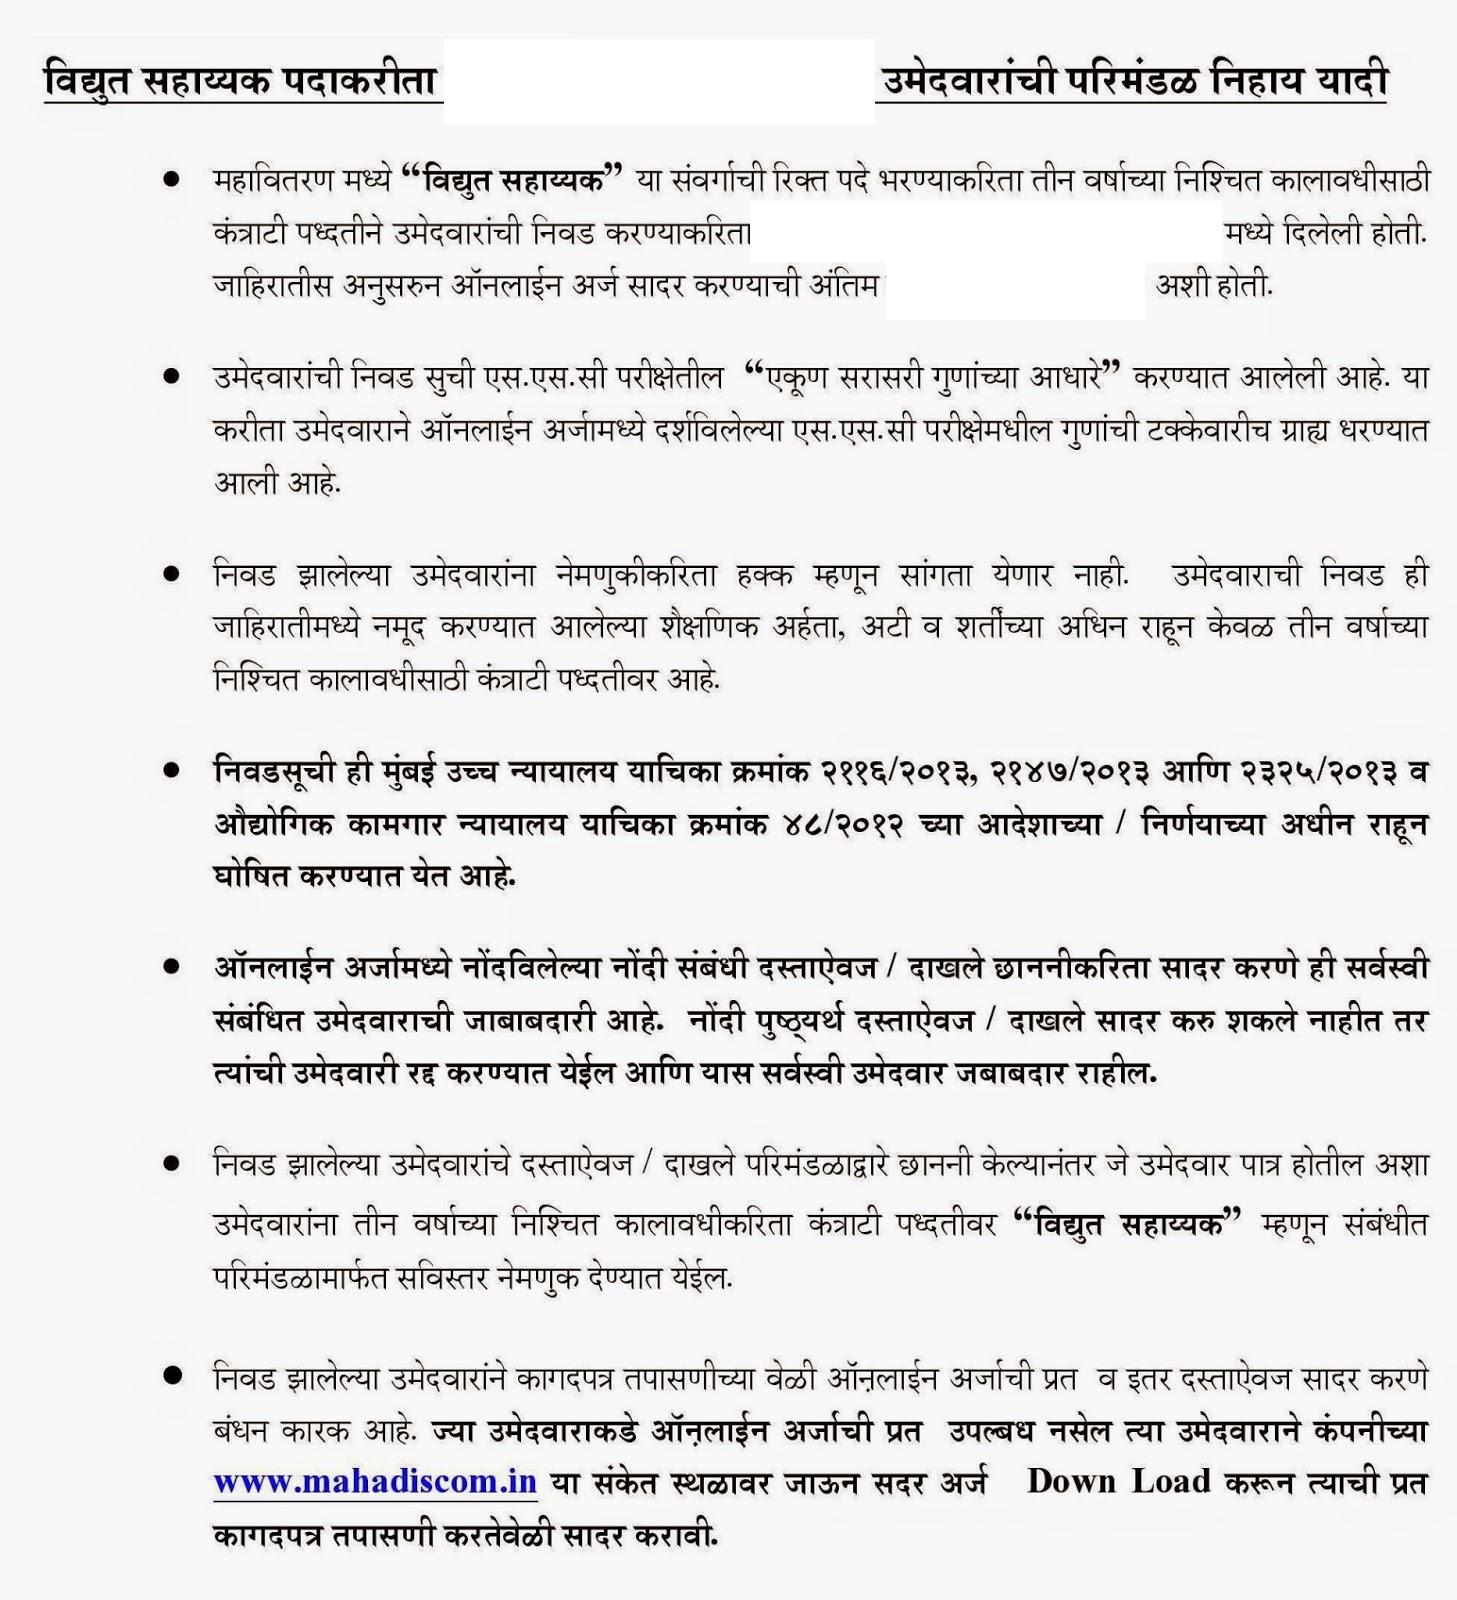 Mahadiscom Vidyut Sahayak Selection List, waiting List 2017